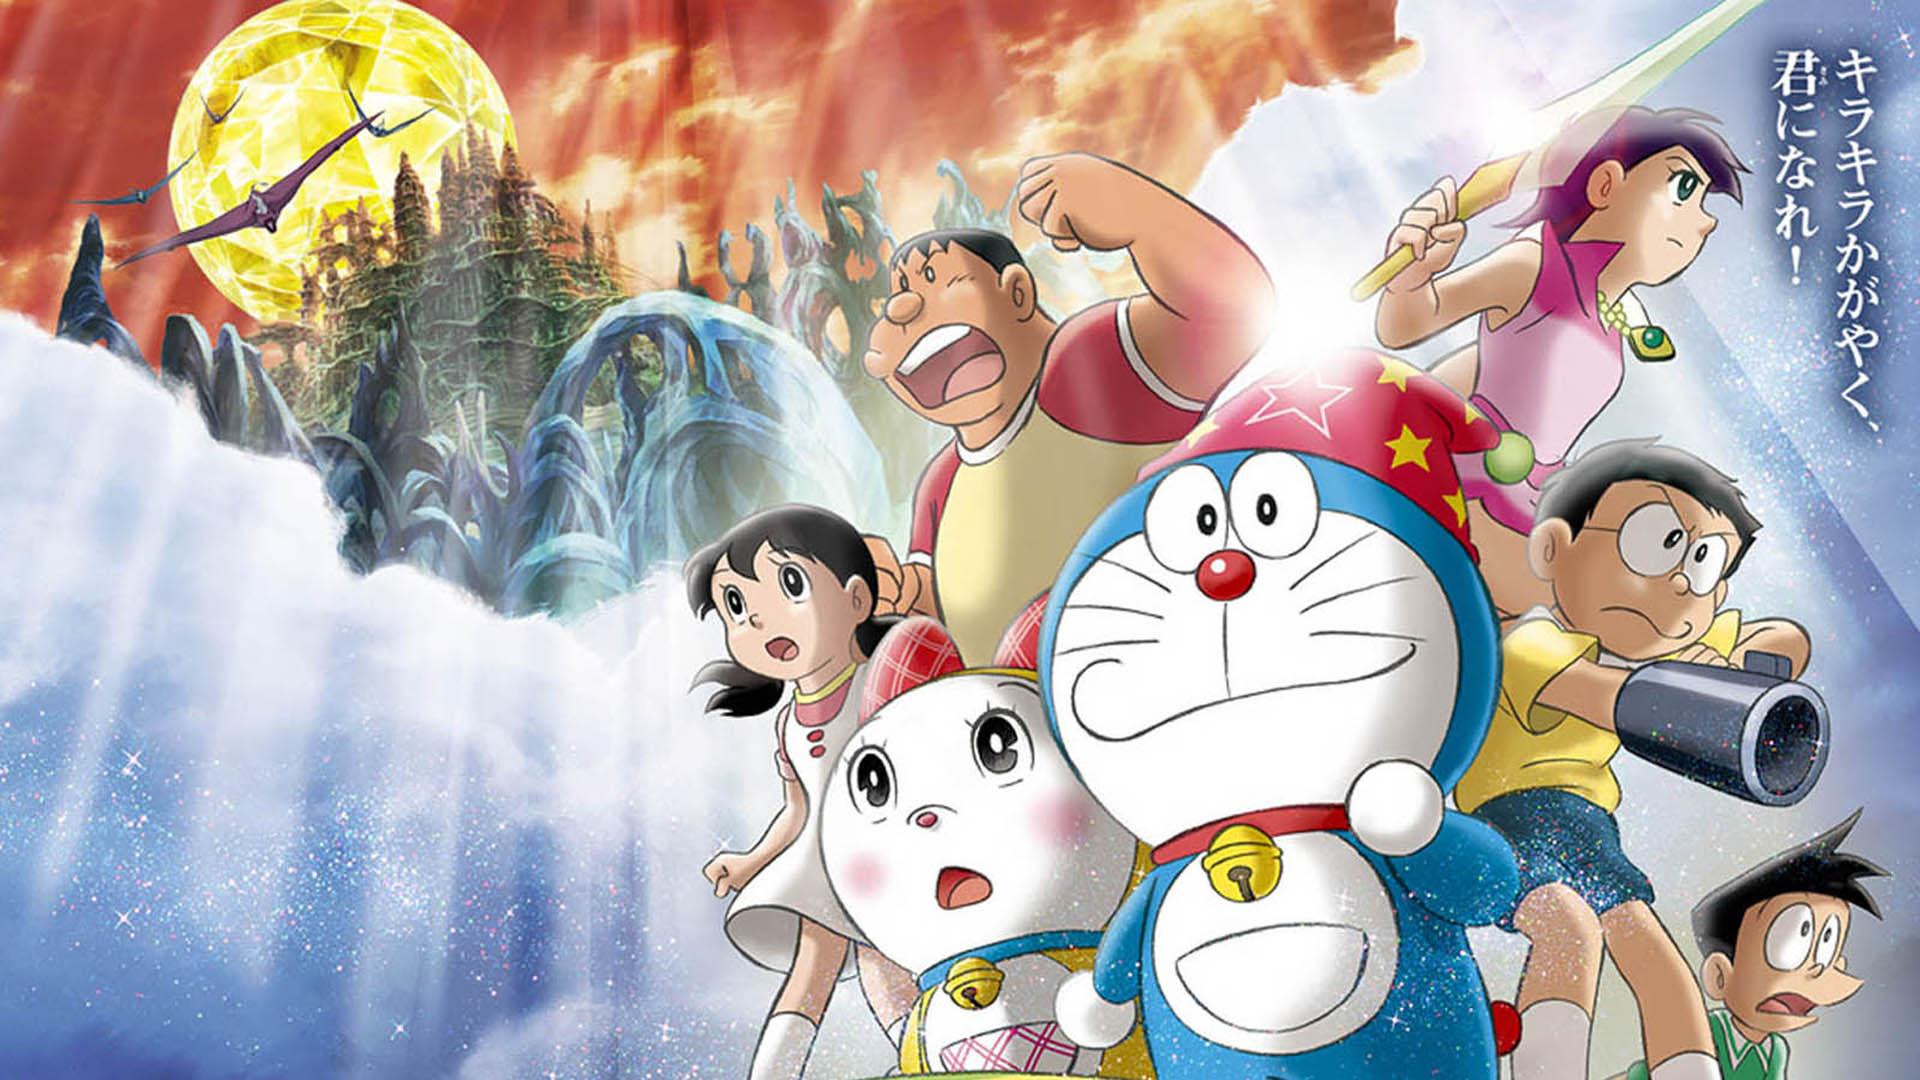 Doraemon-Background-HD-Wallpaper-03